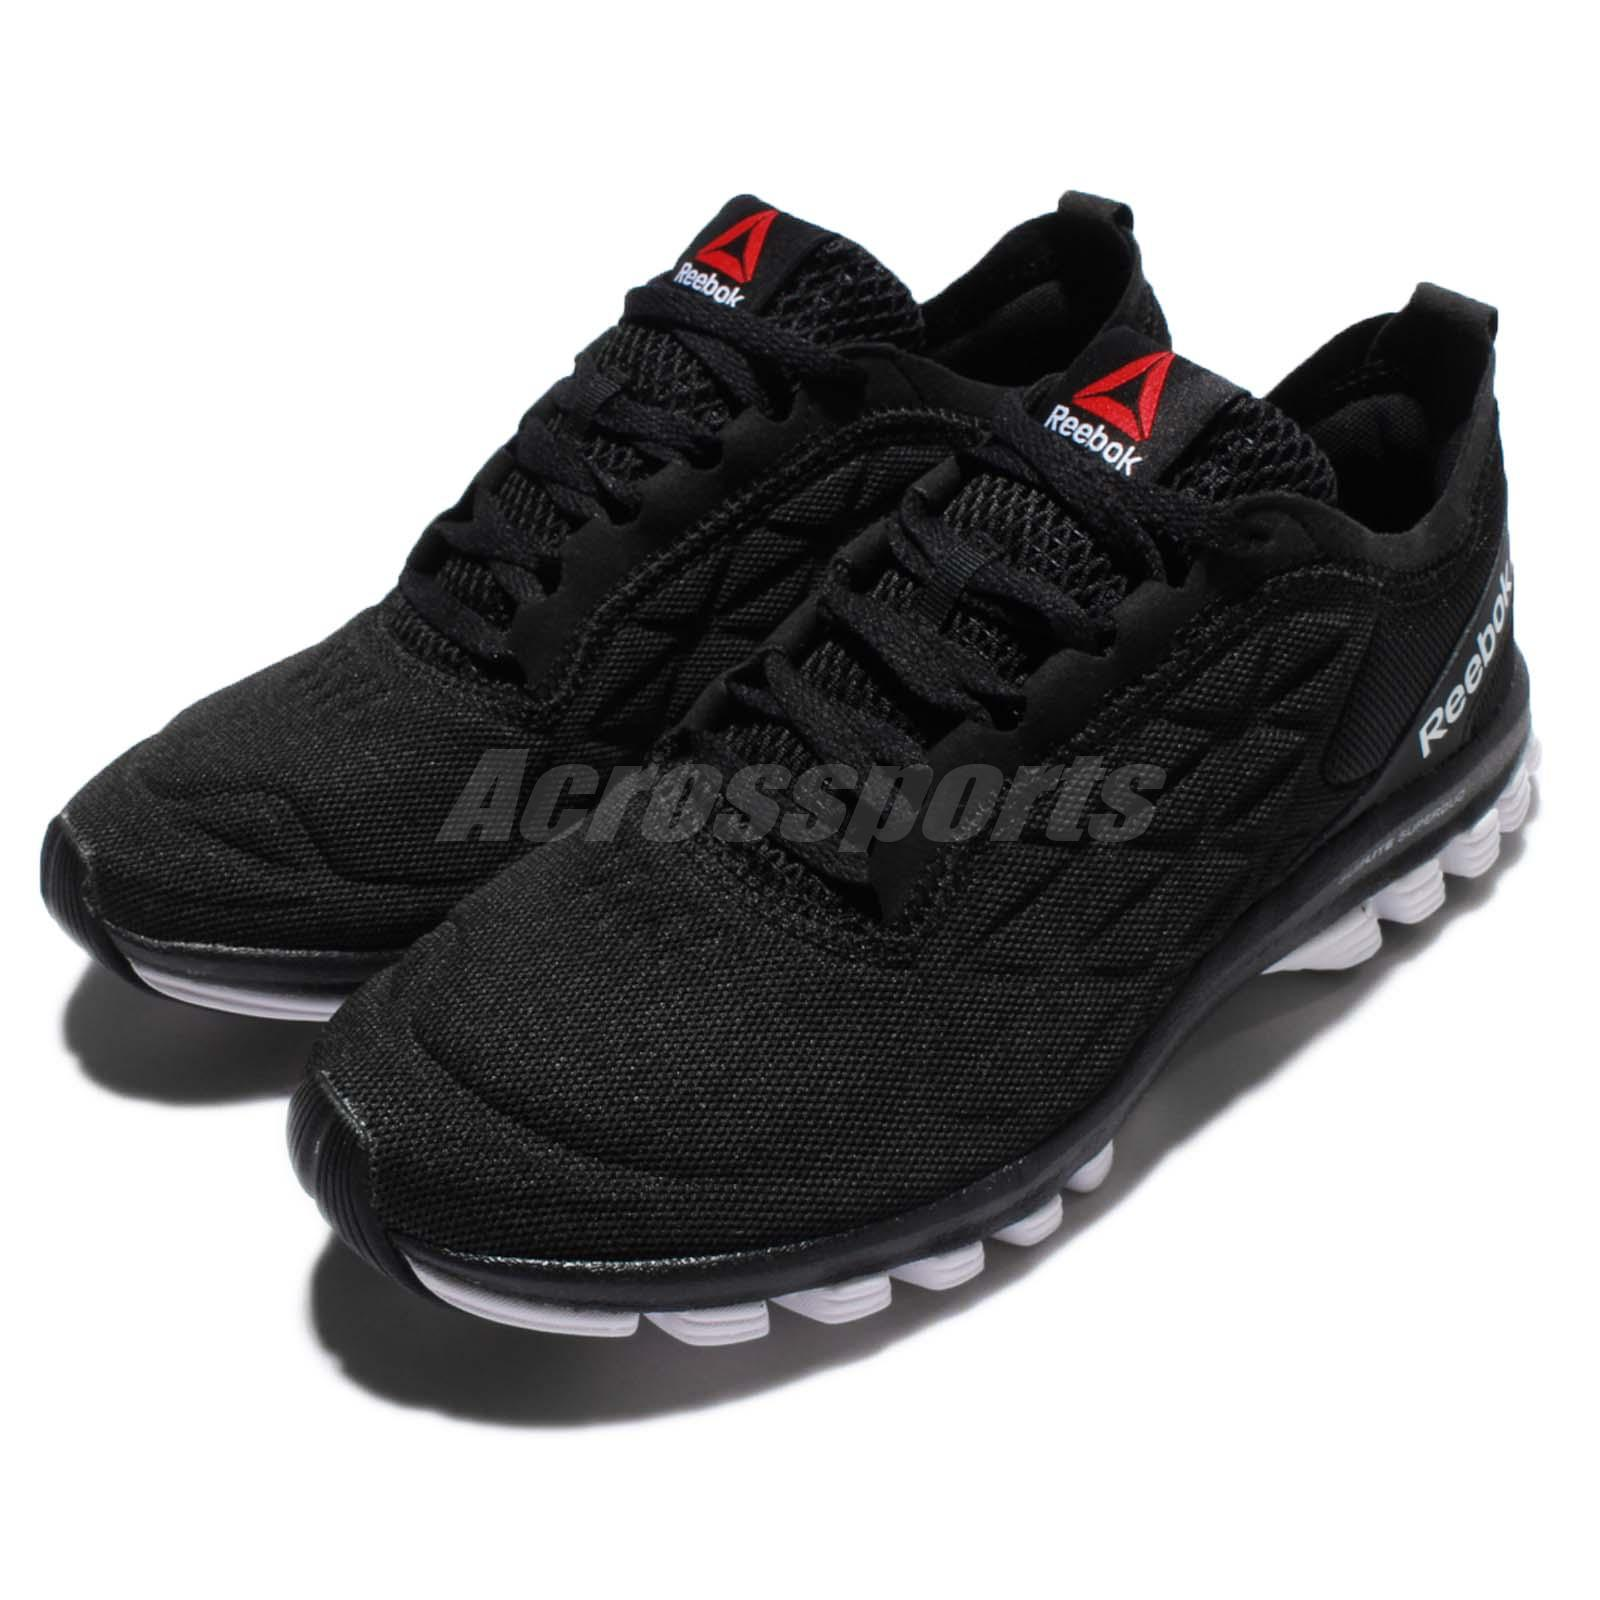 95314e3050b Reebok Sublite Super DUO 3.0 III Black White Women Running Shoes ...